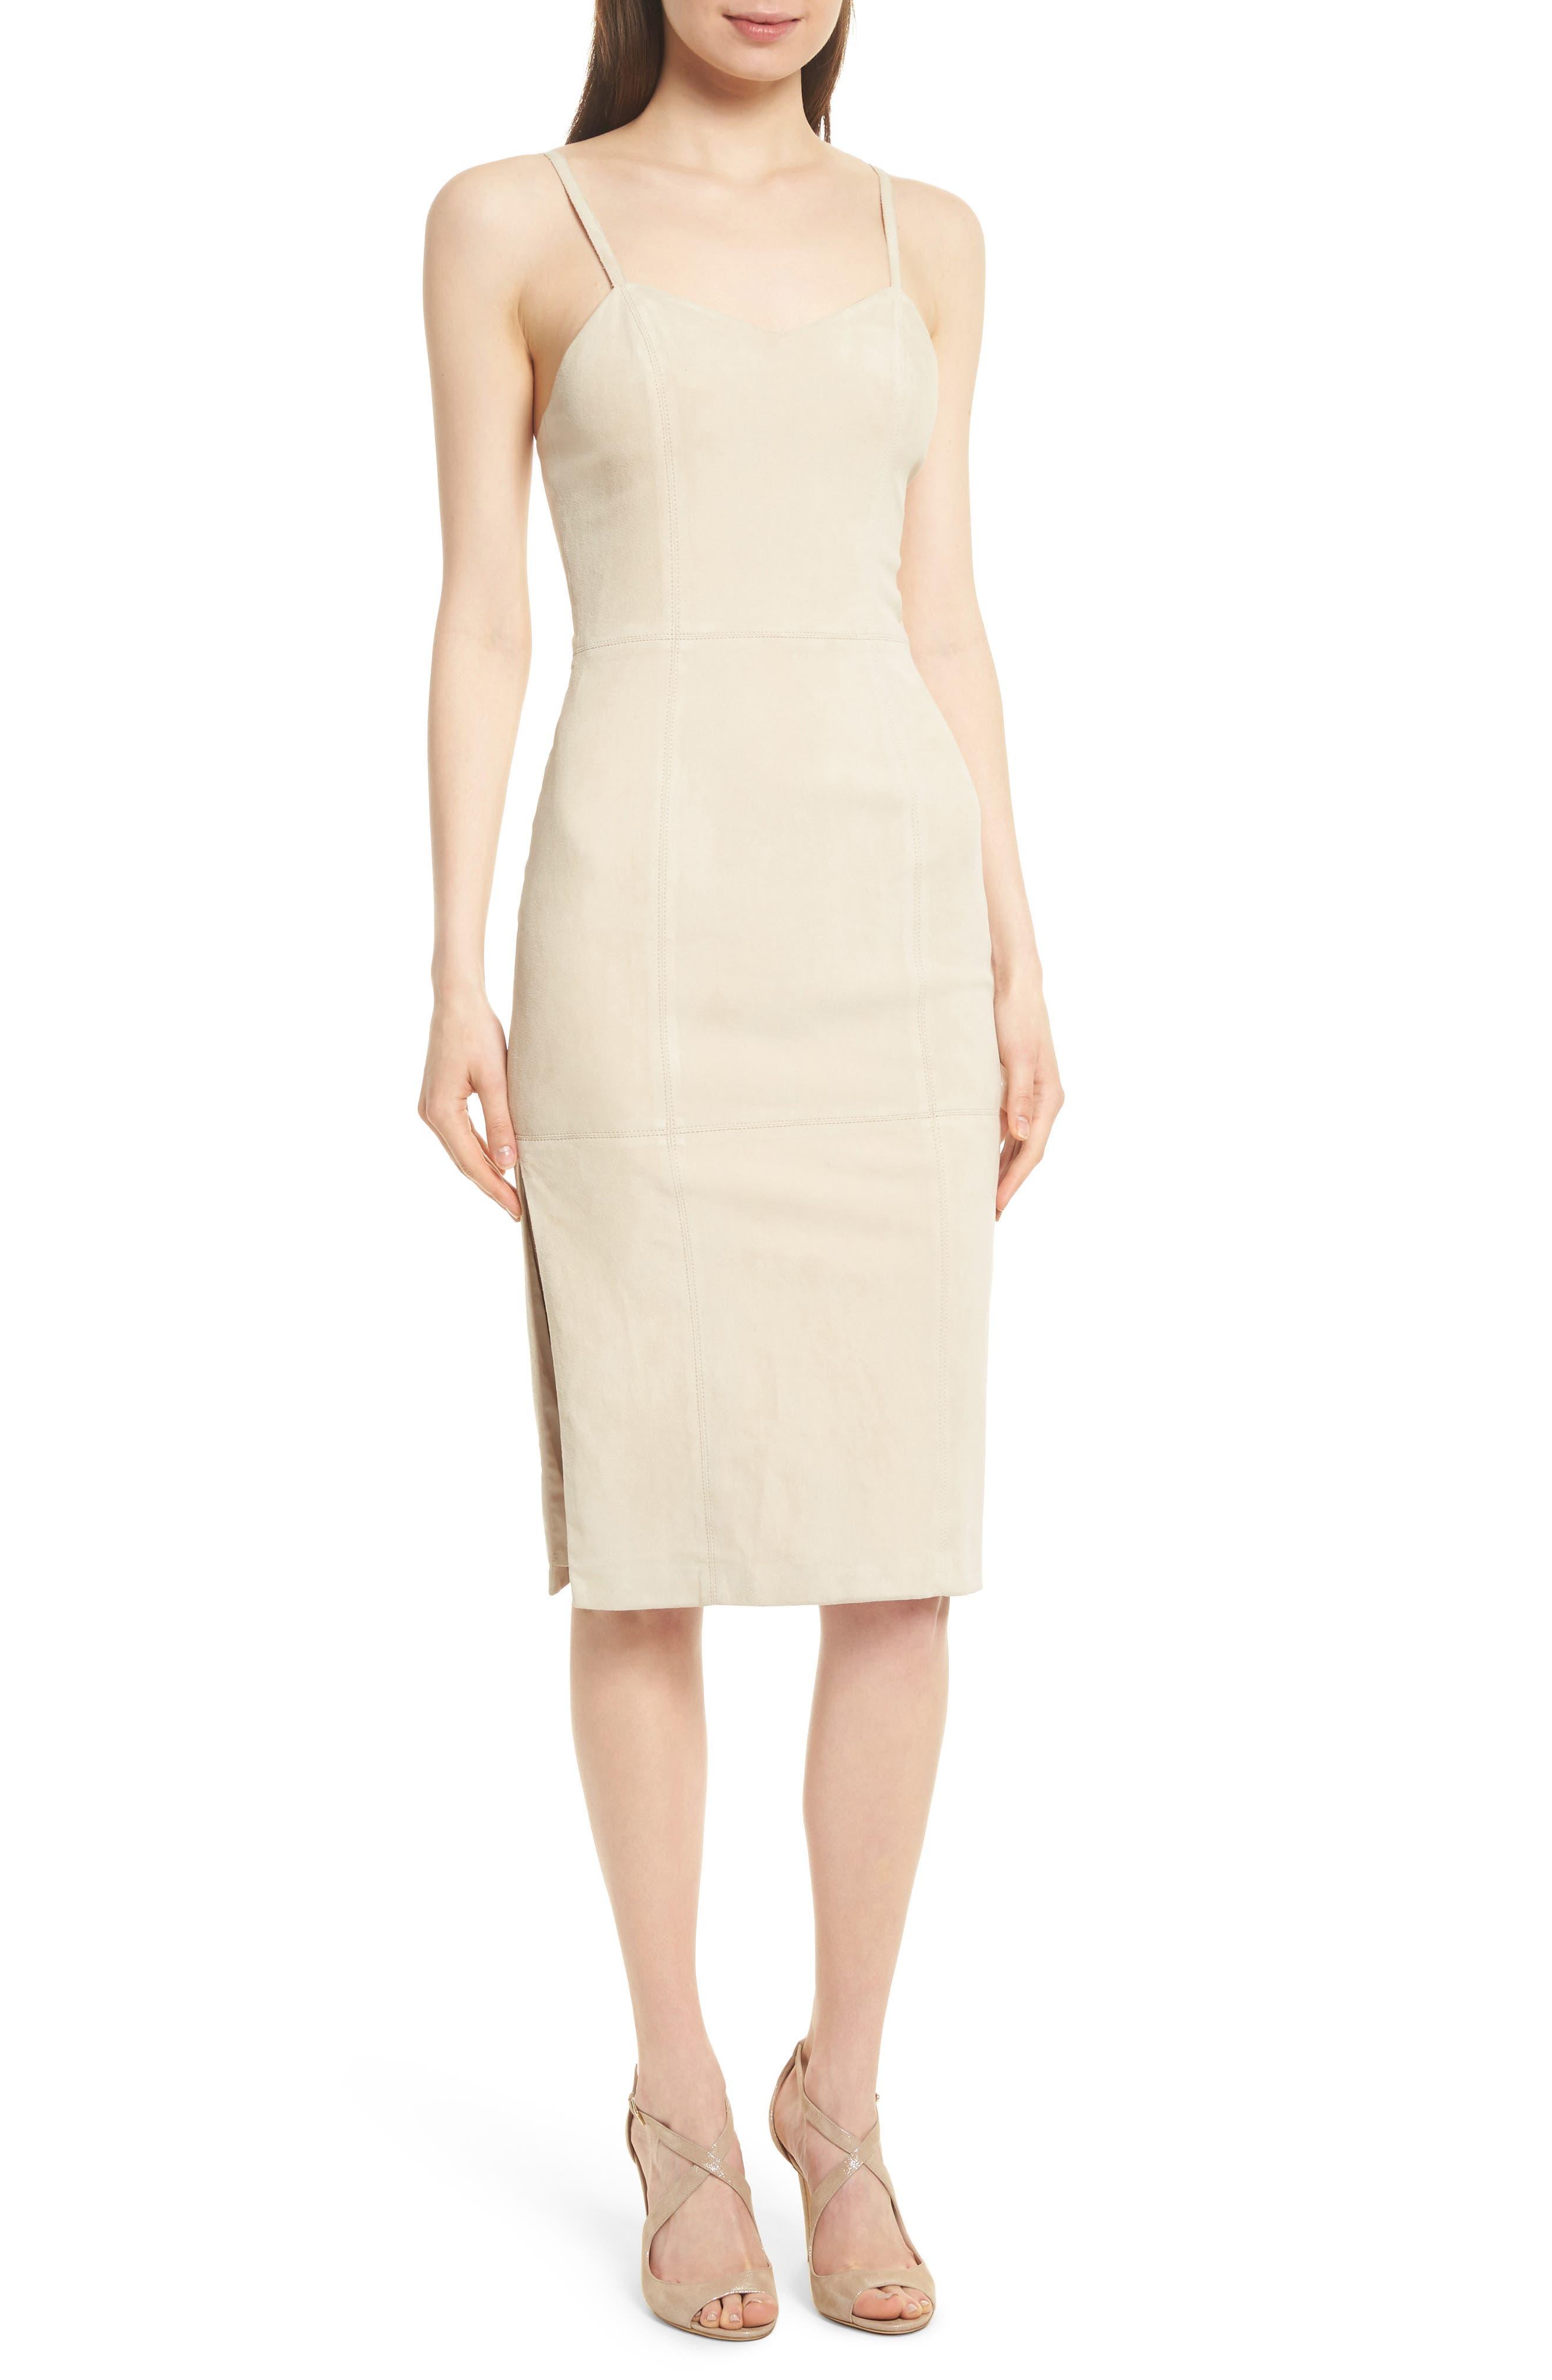 Alice + Olivia Rochell Suede Sheath Dress